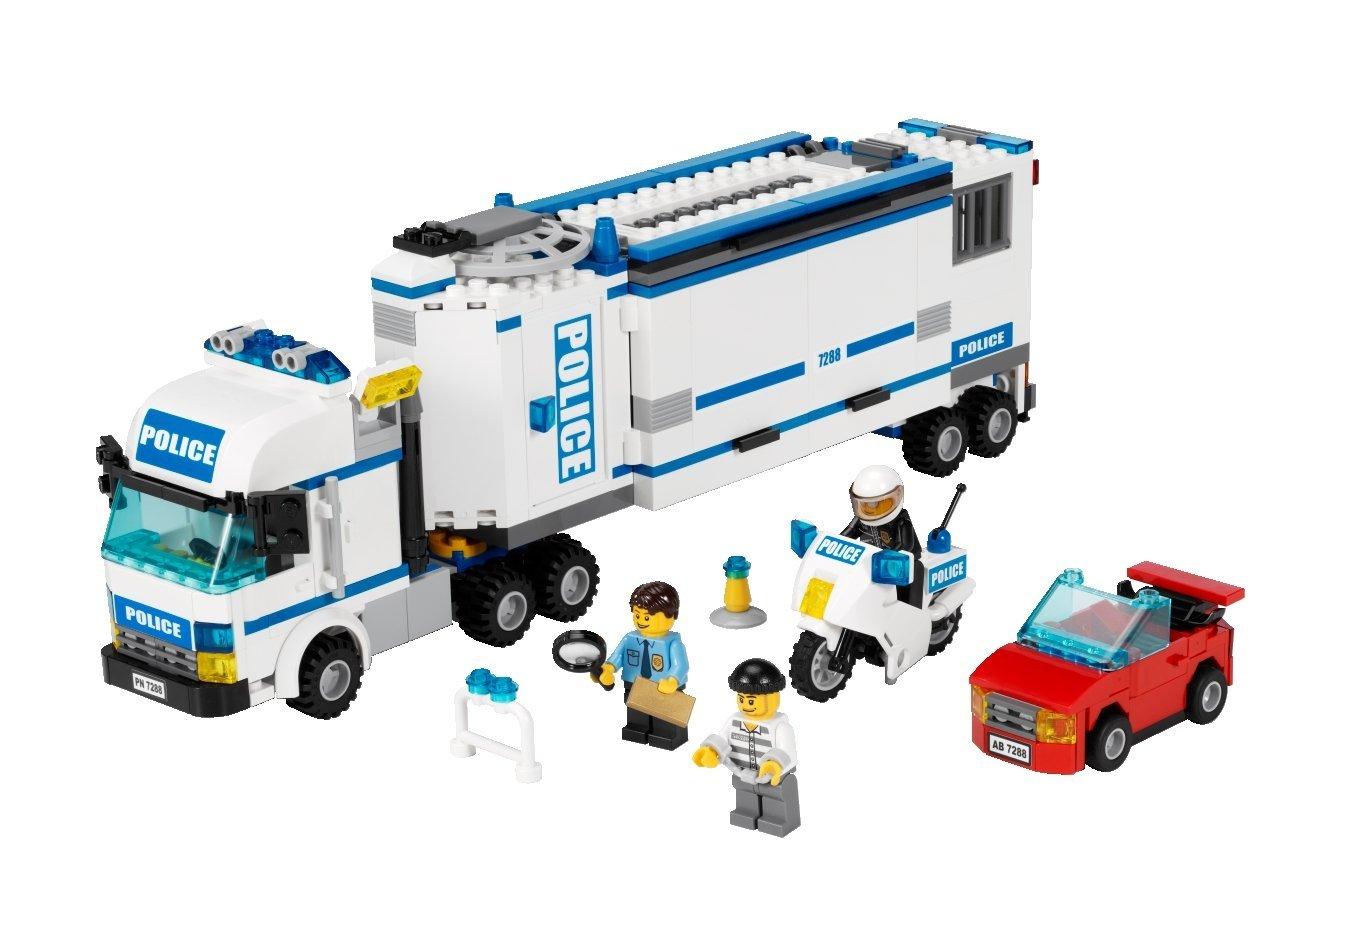 lego 7288 city police - Lgo City Police